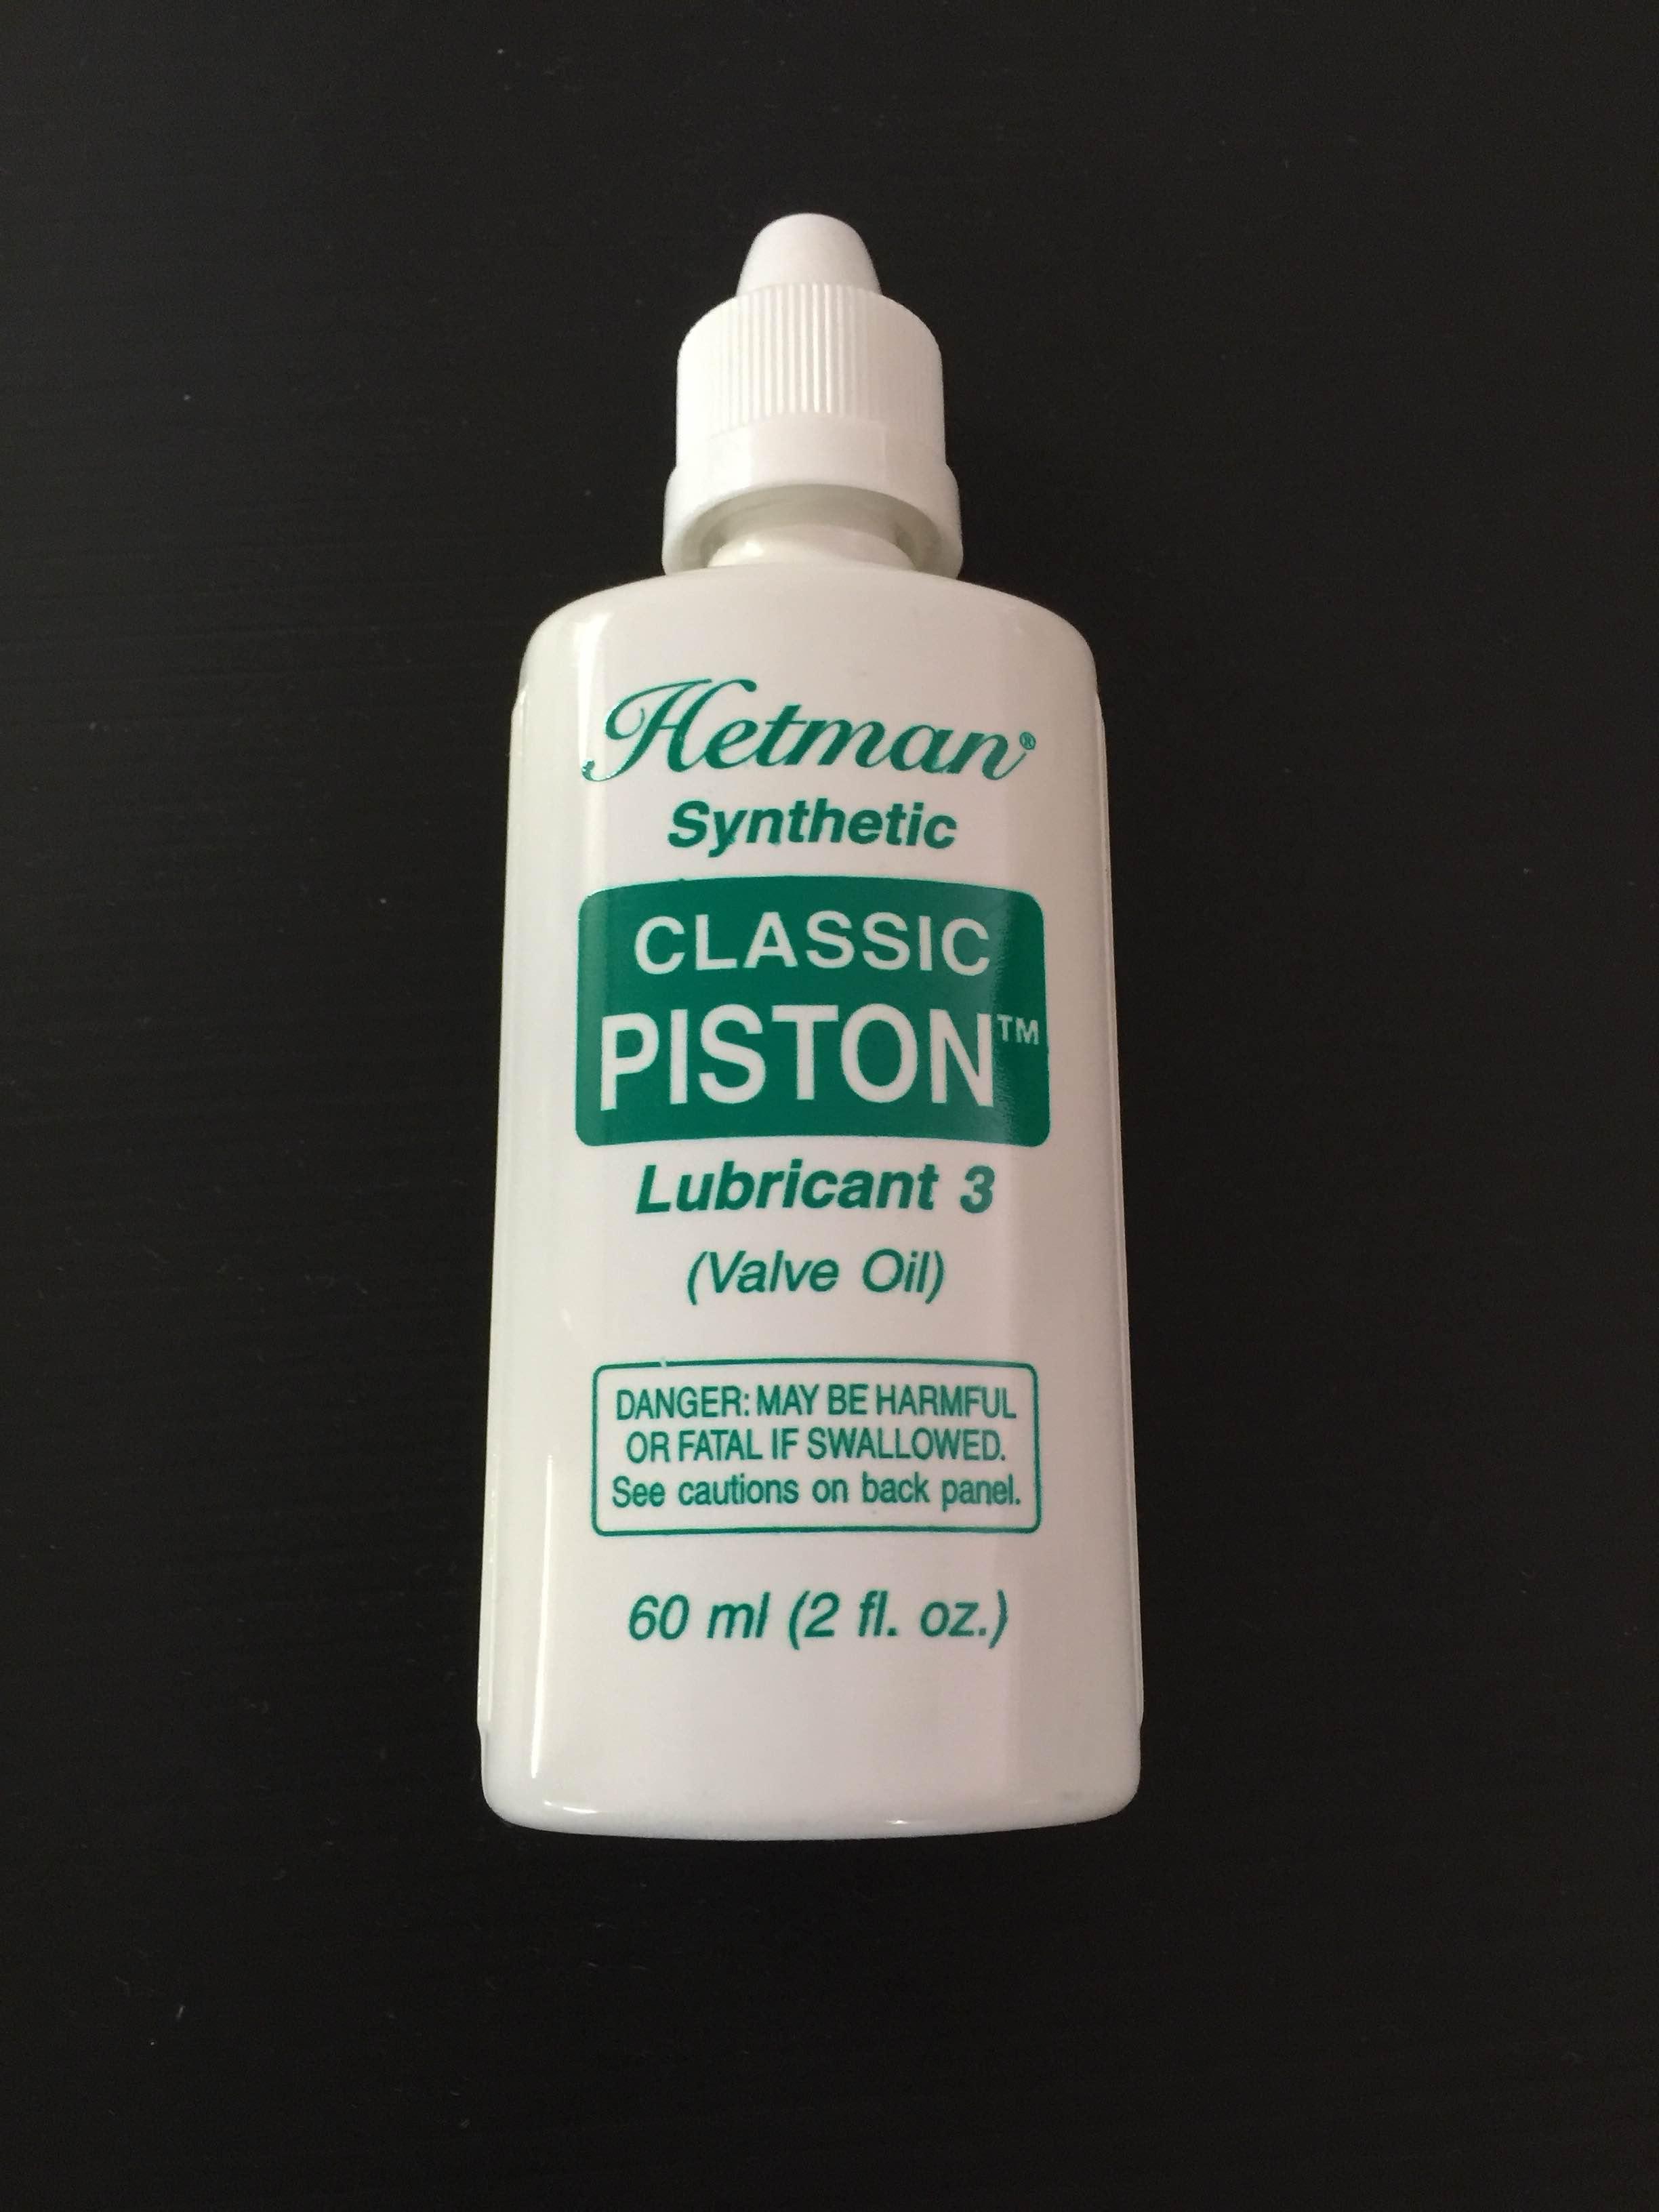 שמן HETMAN מס' 3 CLASSIC PISTON